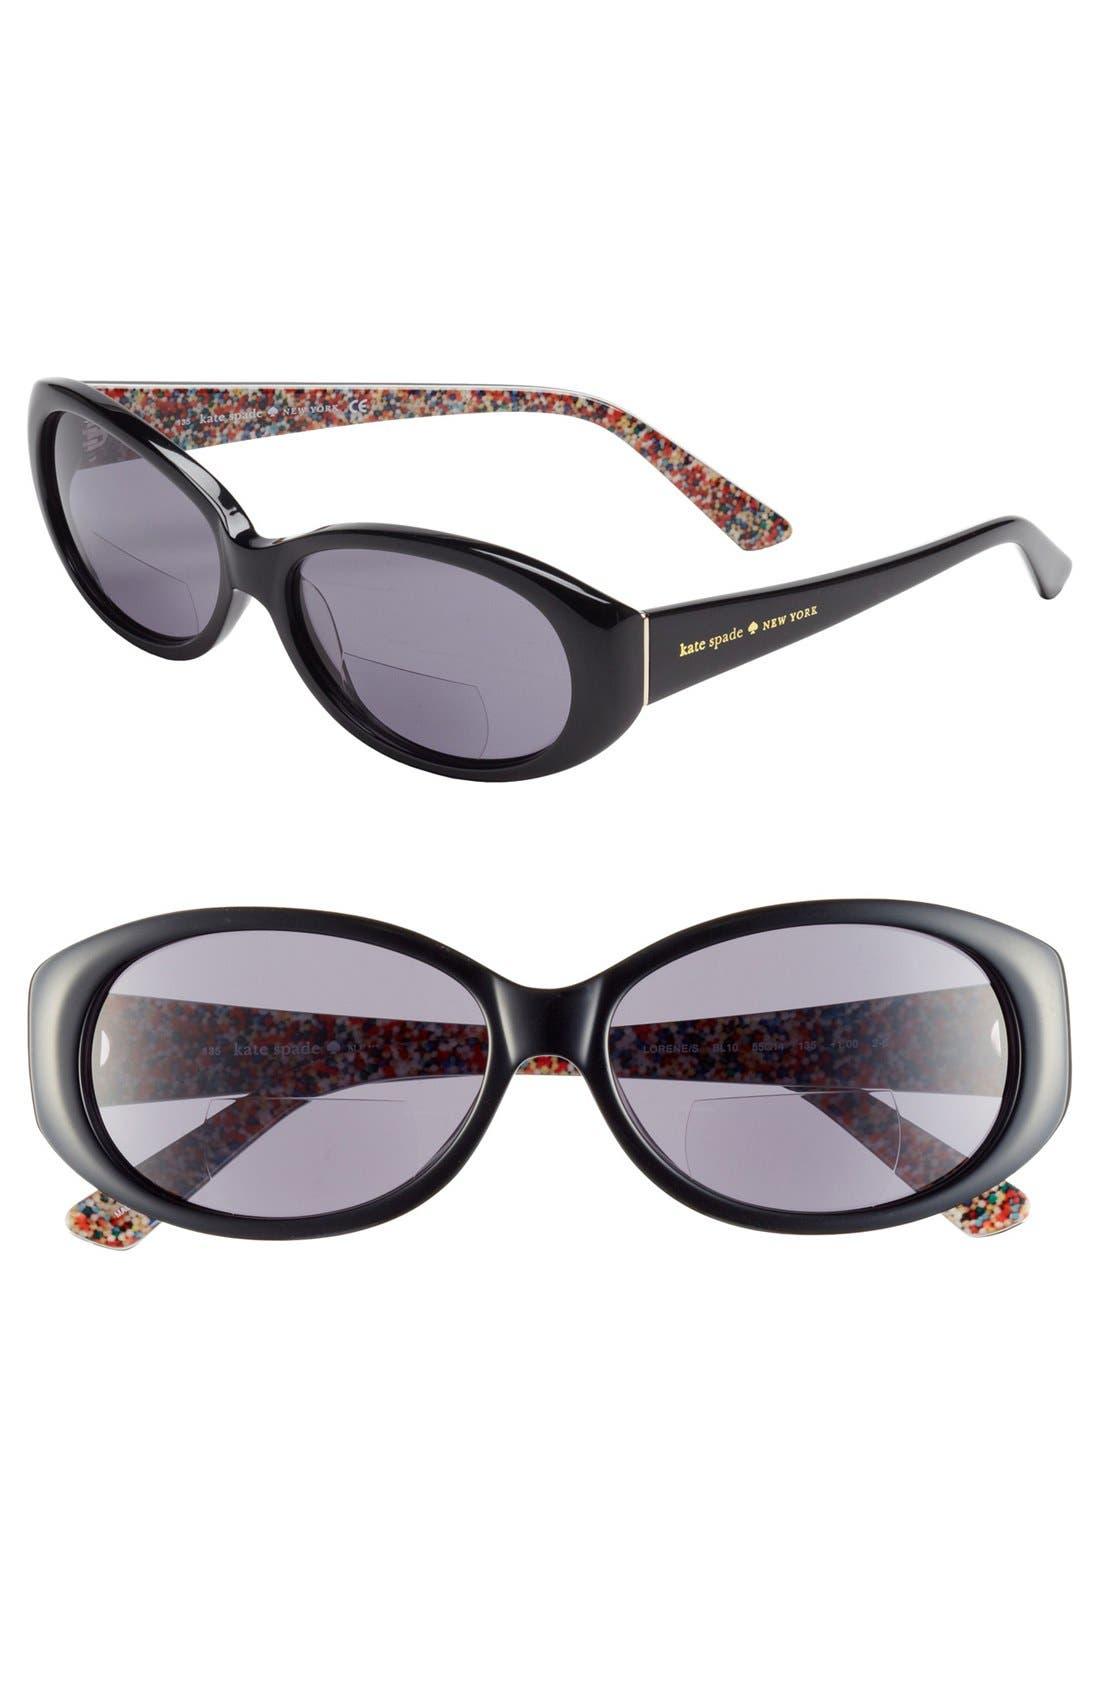 Main Image - kate spade new york 'lorene' reading sunglasses (Online Only)